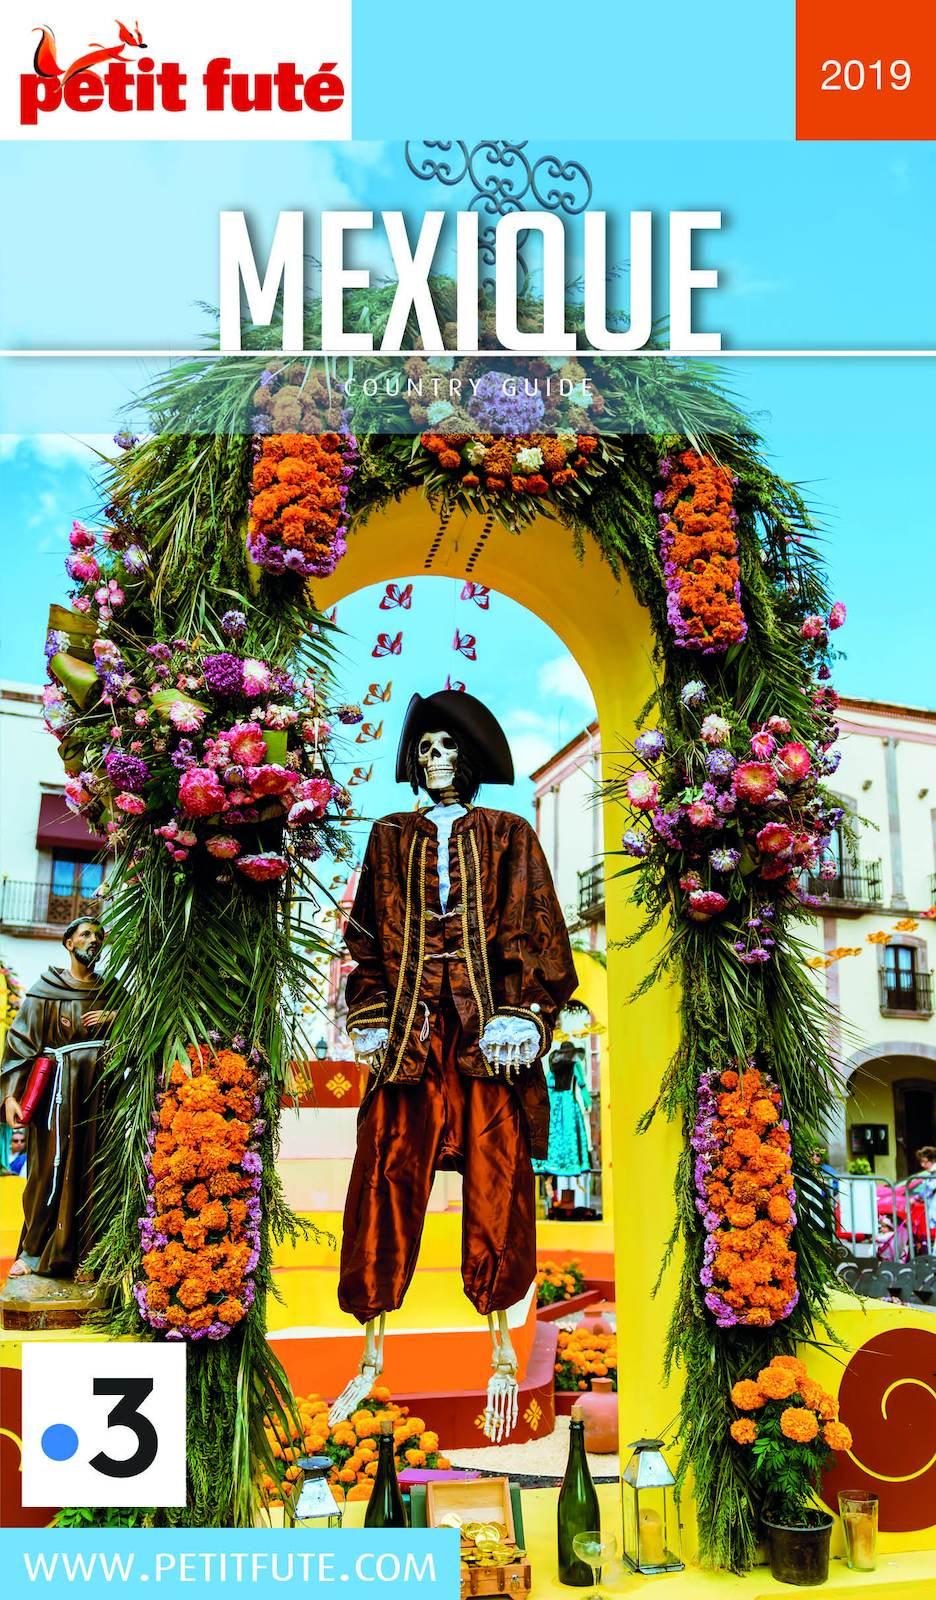 MEXIQUE 2019 Petit Fut?